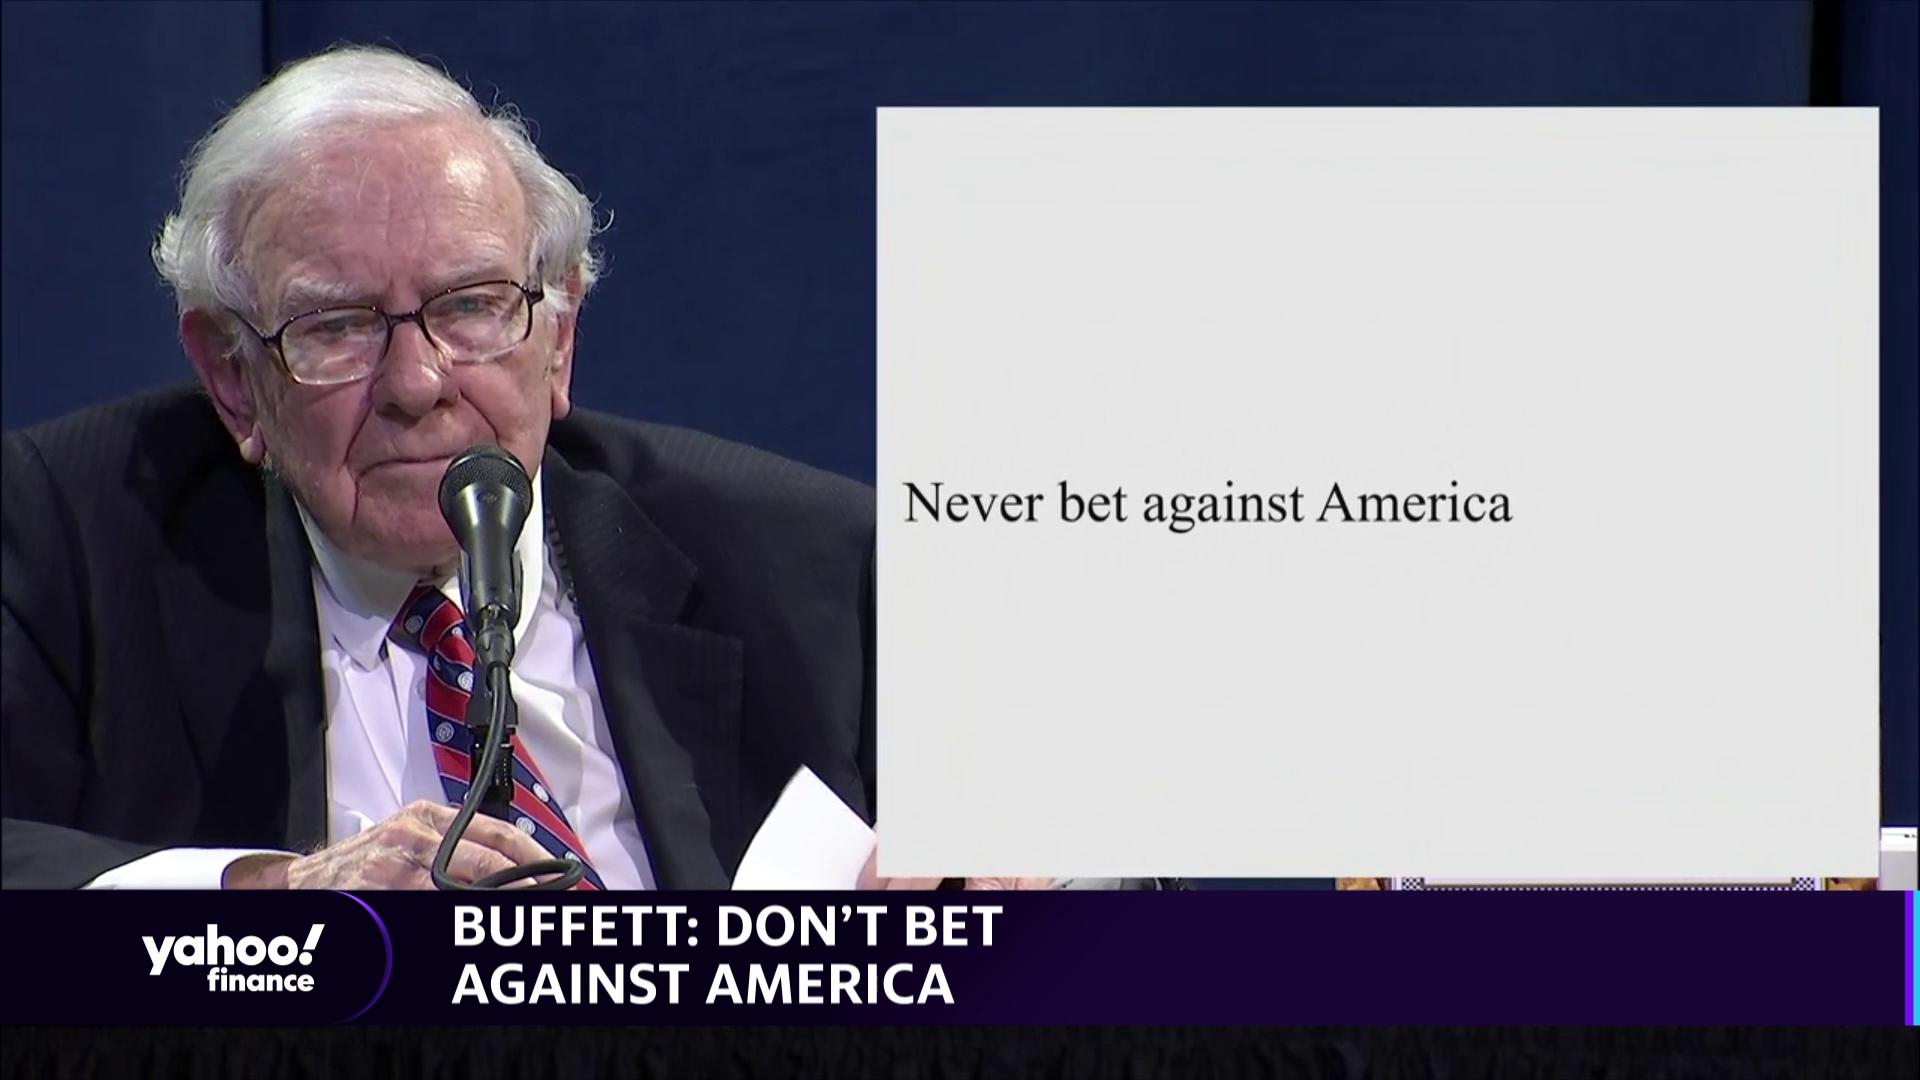 Warren Buffett: 'Don't bet against America'